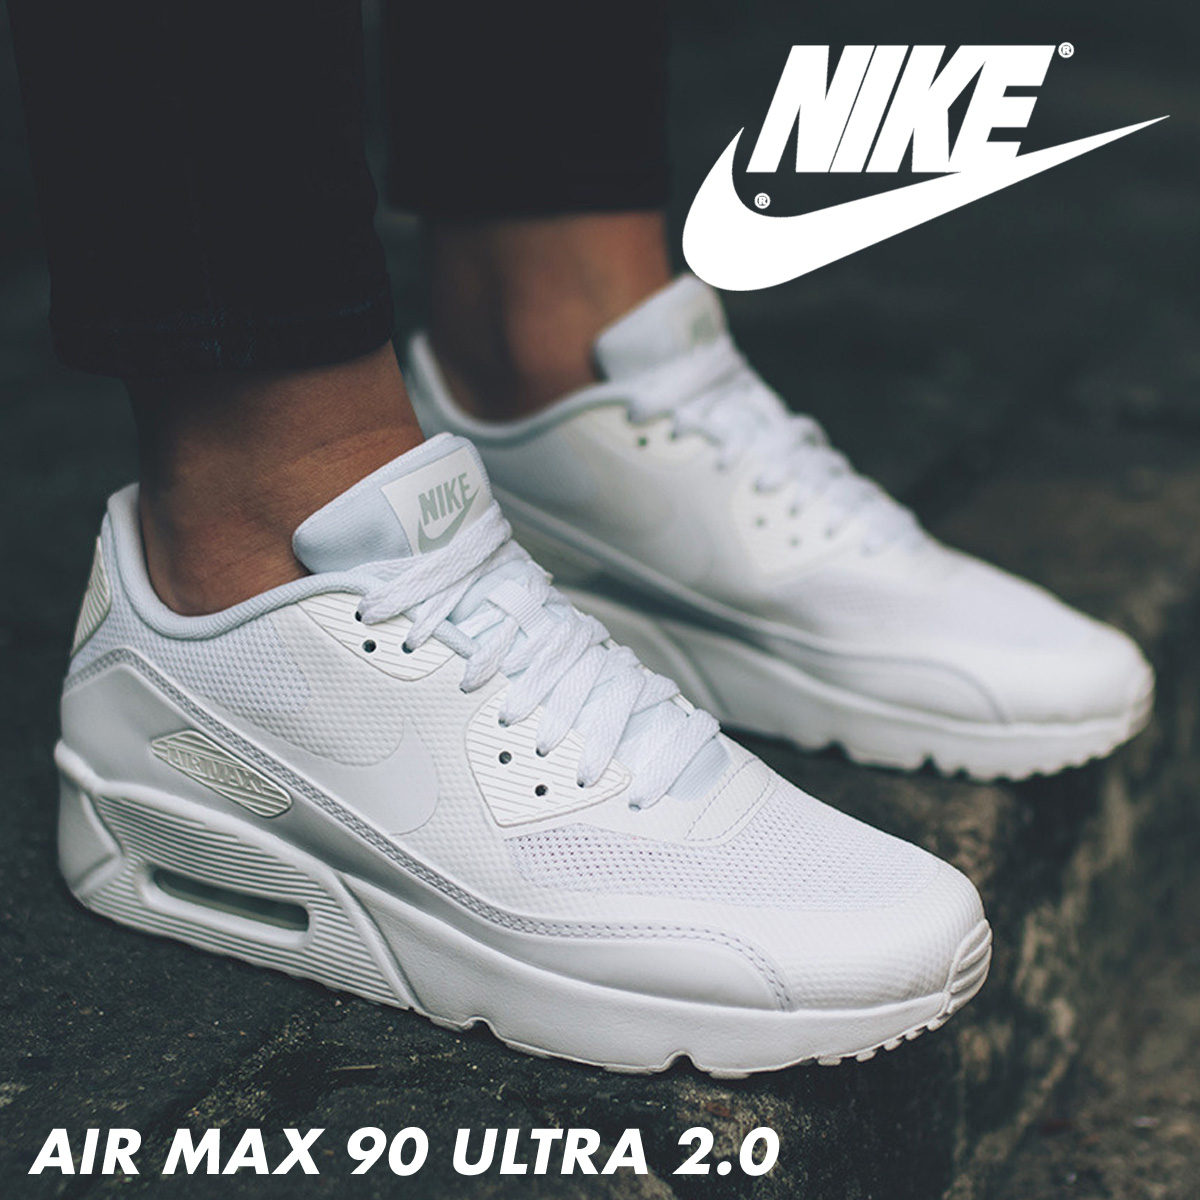 best service b0172 1f7f3 Nike NIKE Air Max 90 ultra Lady s sneakers AIR MAX 90 ULTRA ESS 2.0 GS  869,950-100 shoes white  7 29 Shinnyu load